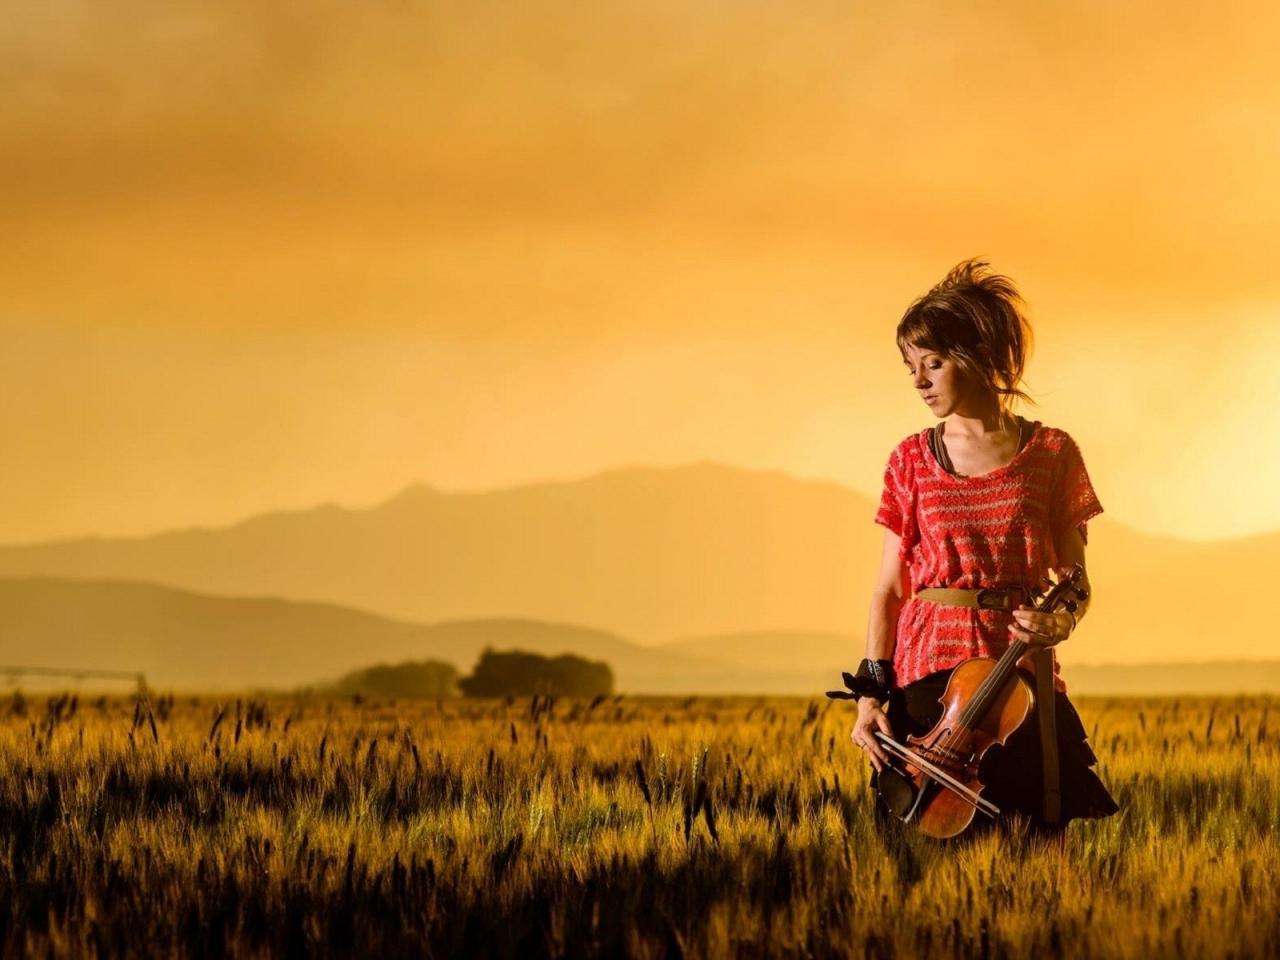 Una mujer violinista - 1280x960